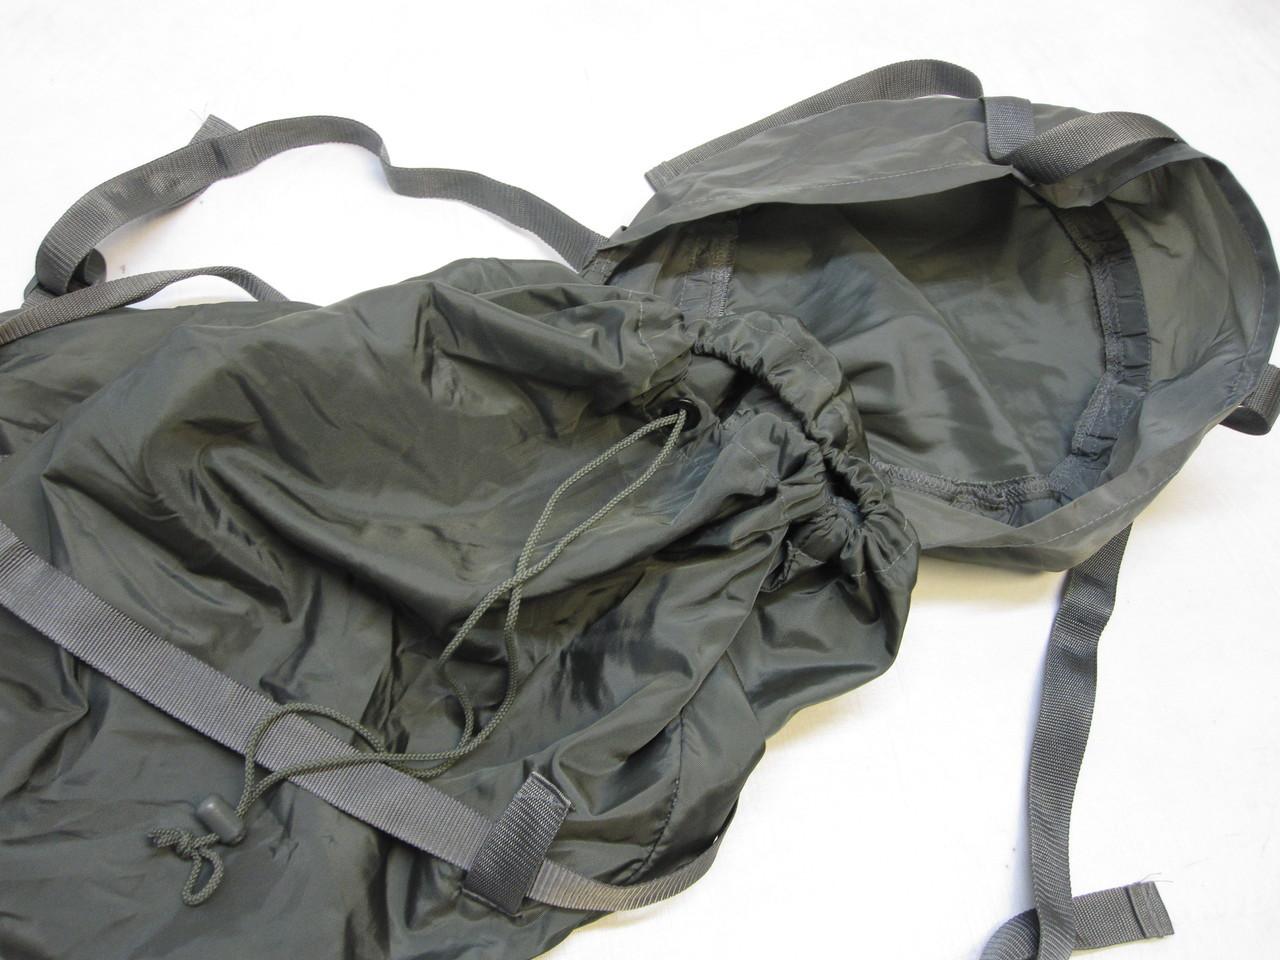 ARMY FOLIAGE GREY SLEEPING BAG LARGE COMPRESSION SACK MILITARY SLEEP SYSTEM